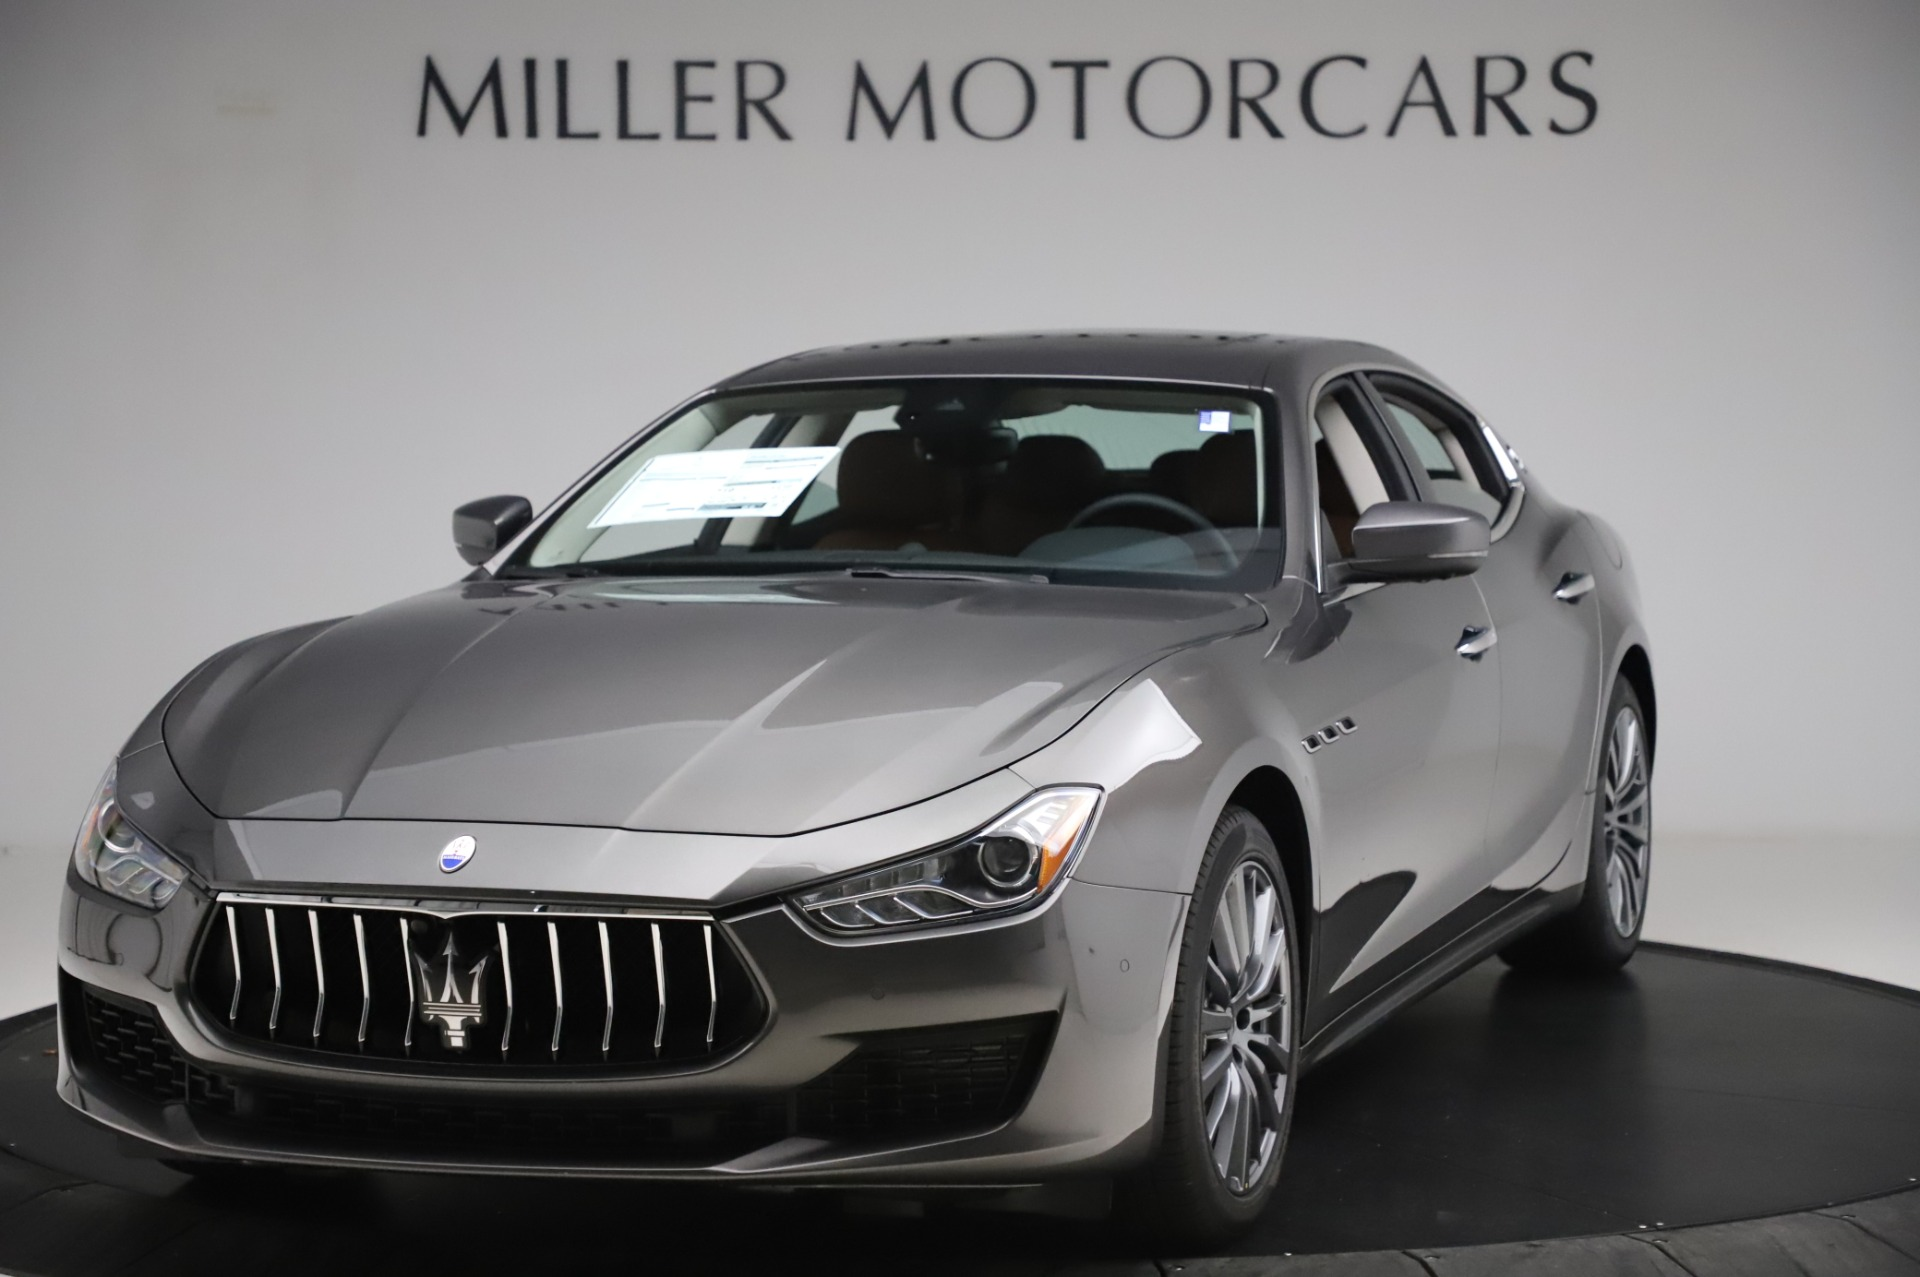 New 2020 Maserati Ghibli S Q4 for sale $83,785 at McLaren Greenwich in Greenwich CT 06830 1